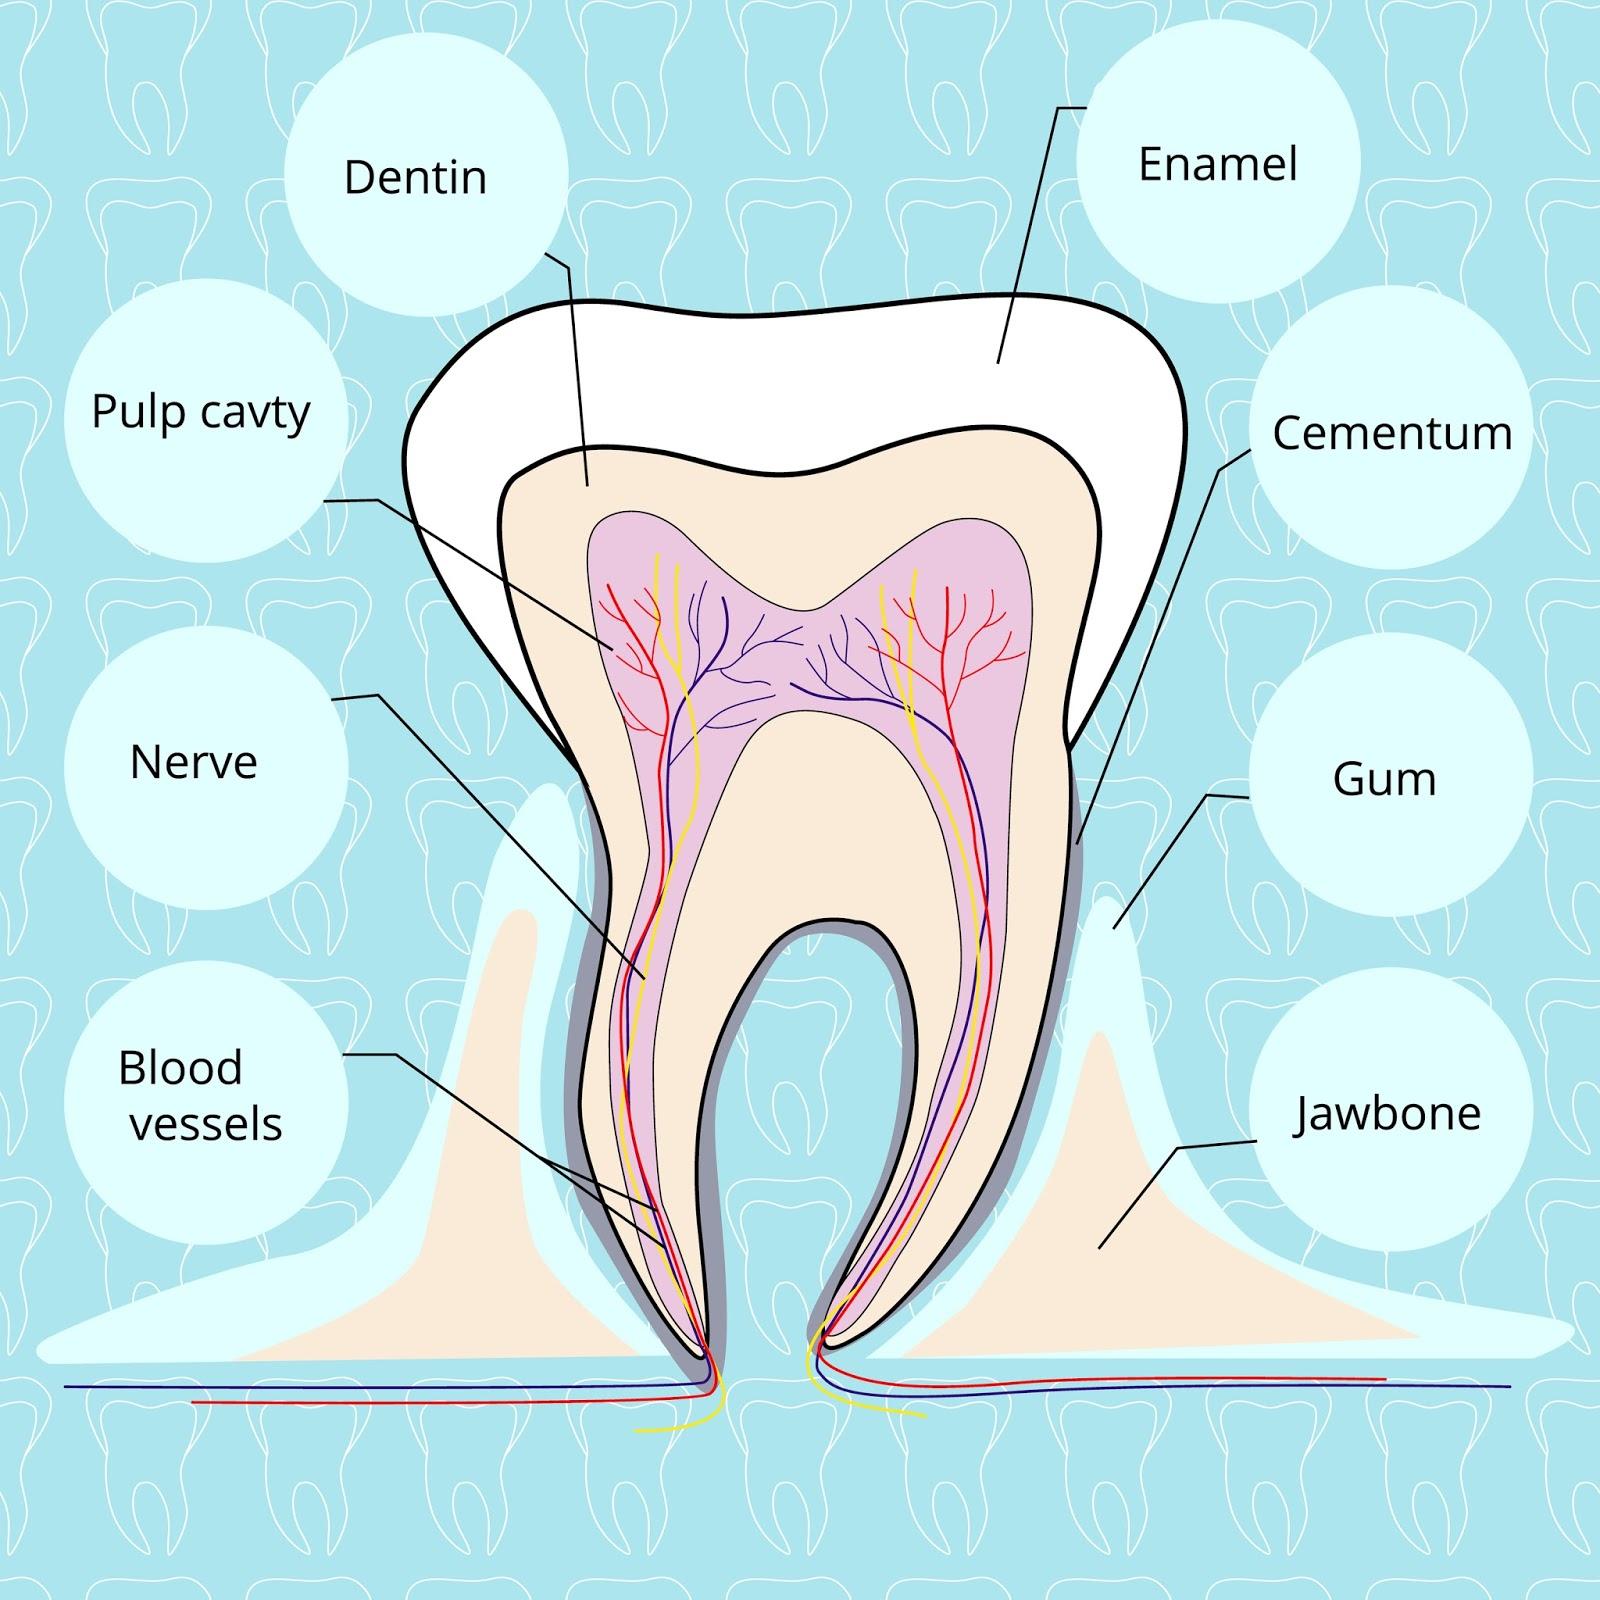 Tooth Anatomy - Premier Dental Associates of Lower Manhattan